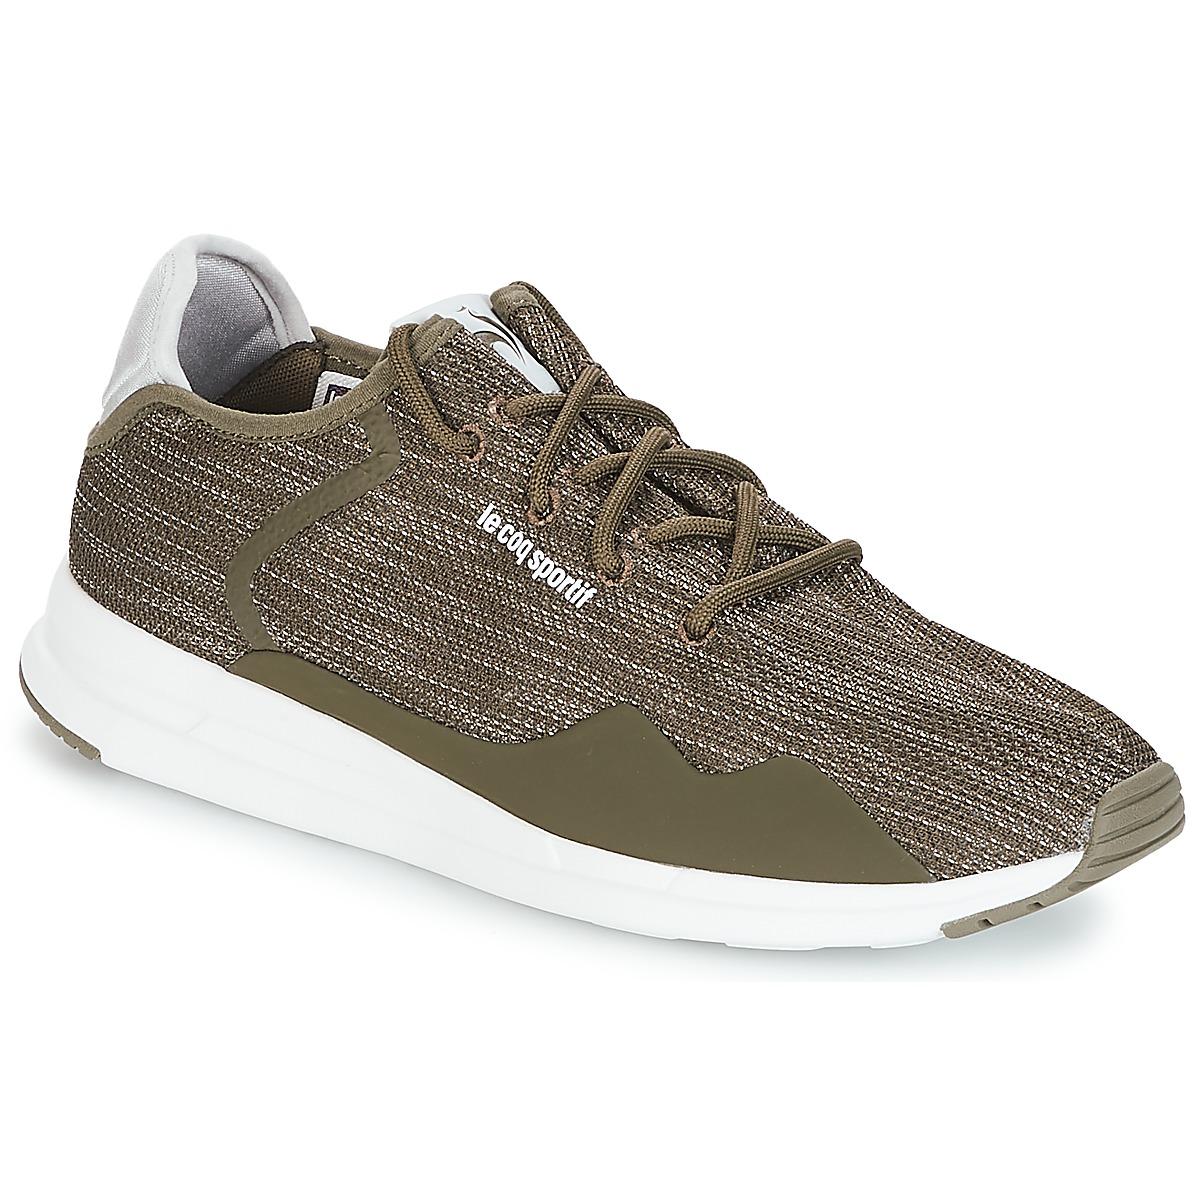 Le Coq Sportif SOLAS PREMIUM Olive / Kiesel - Kostenloser Versand bei Spartoode ! - Schuhe Sneaker Low Herren 89,99 €